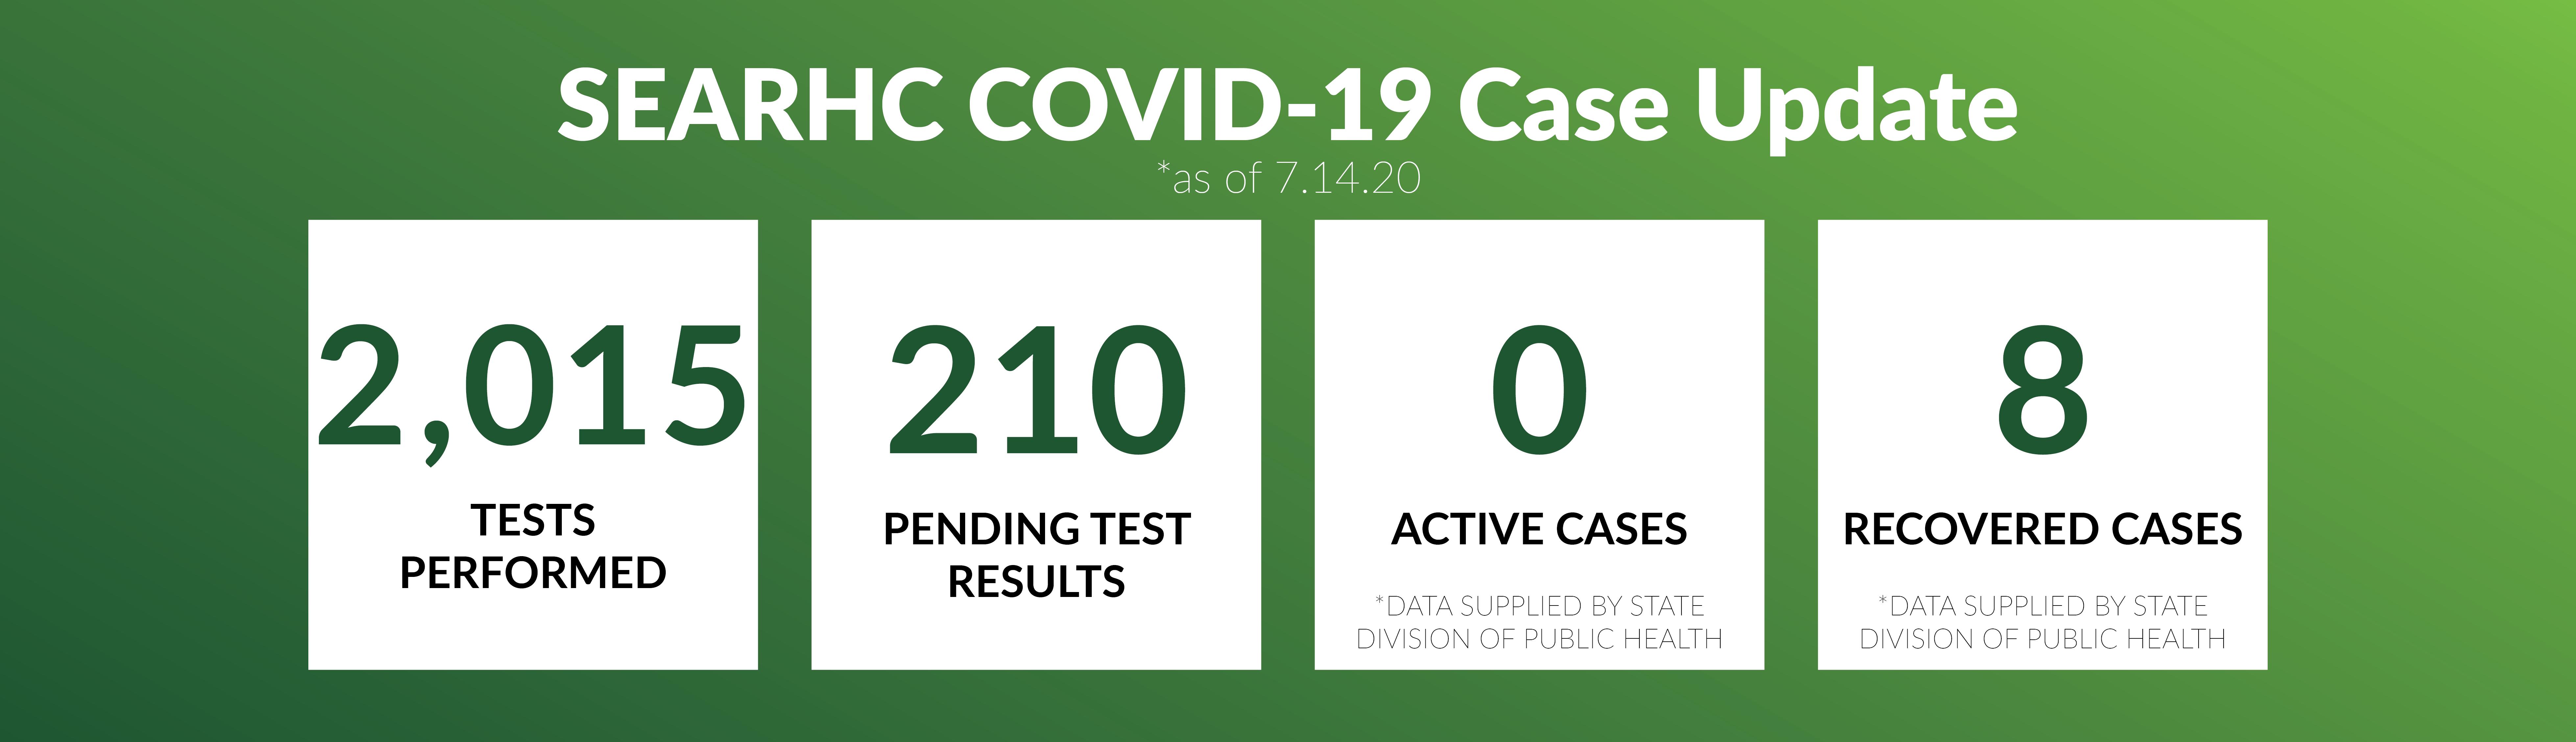 07-13-20 SEARHC COVID-19 metrics